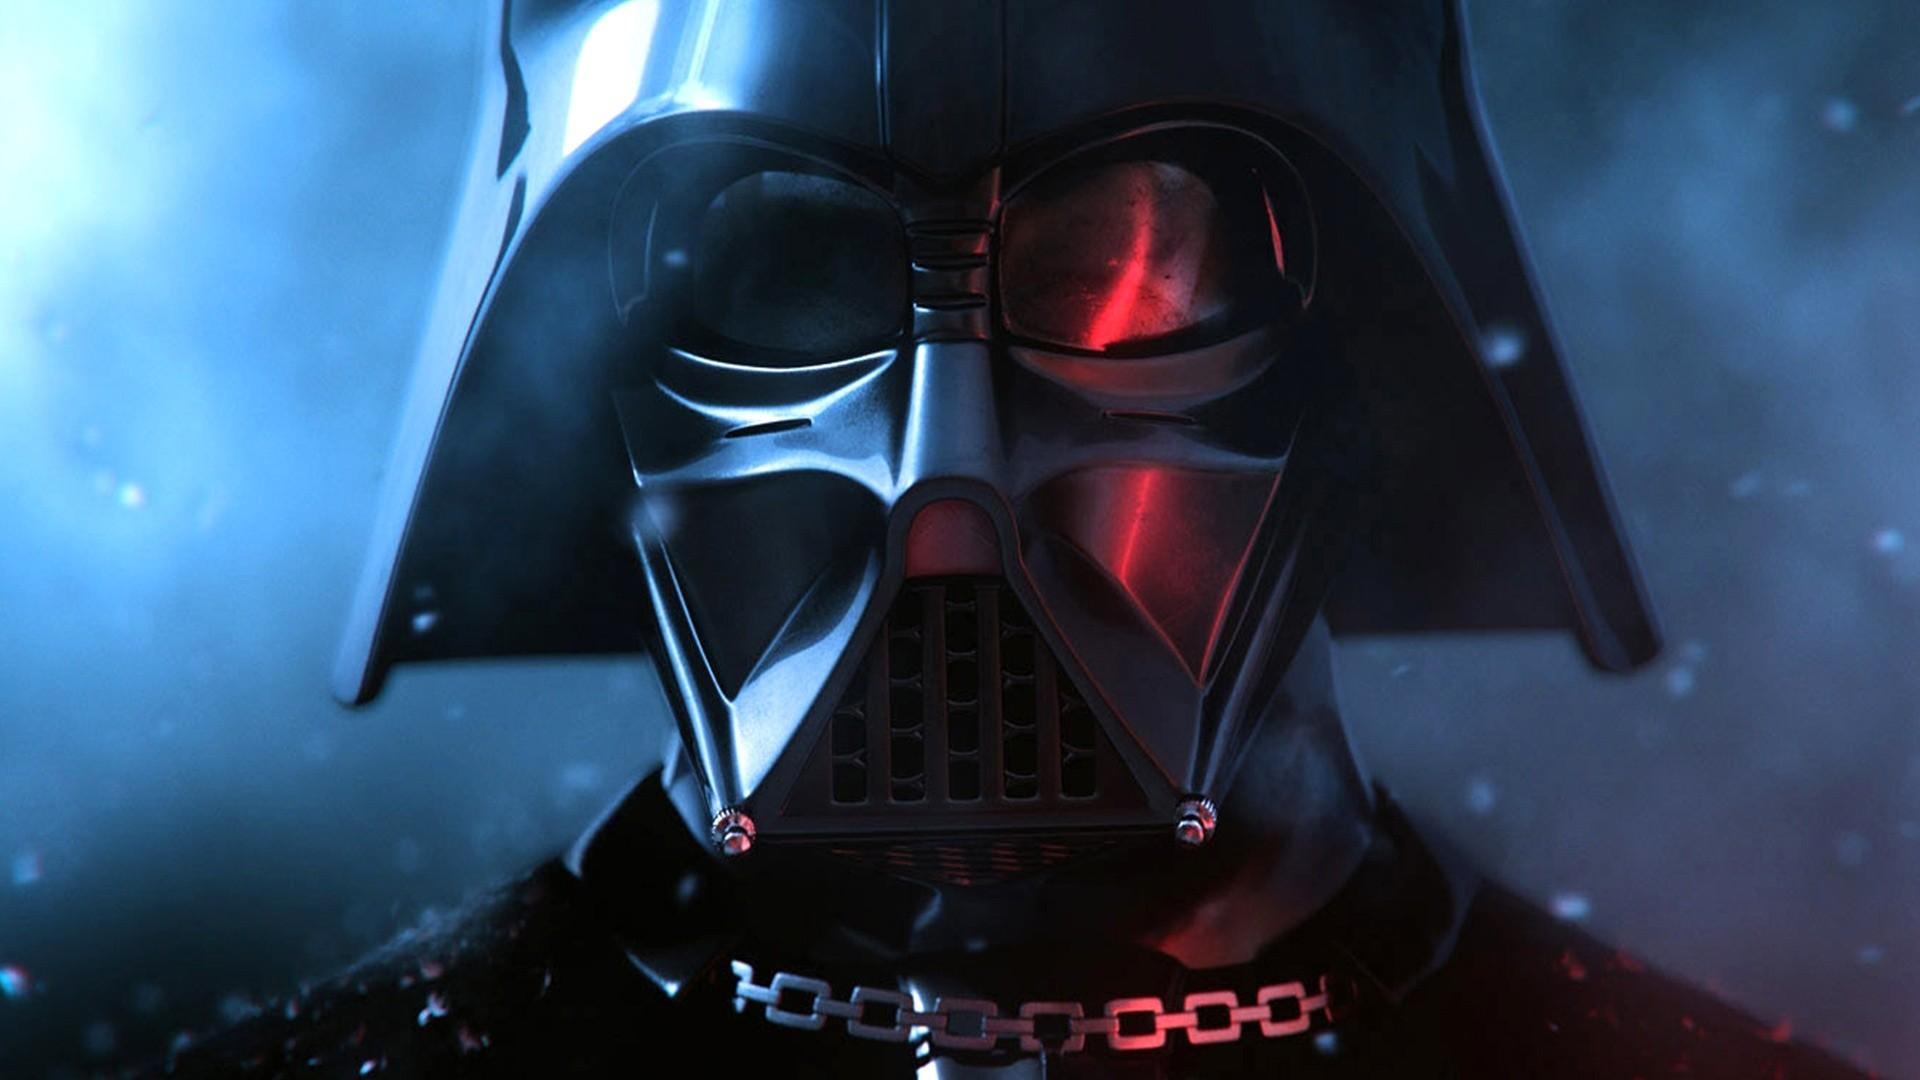 General 1920x1080 Star Wars Darth Vader Sith mask